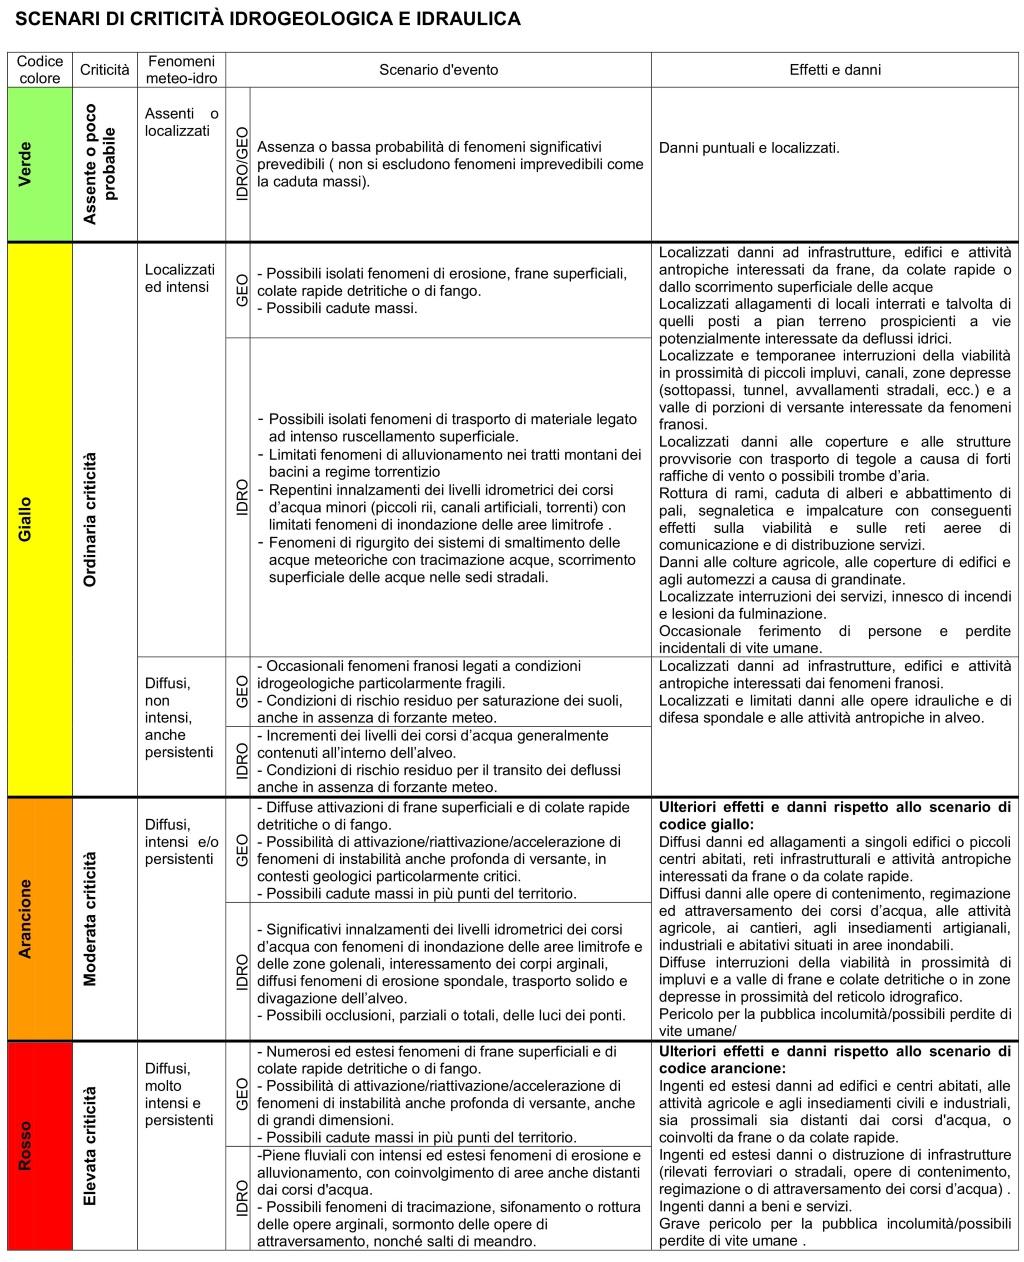 Tabella Scenari Criticita Idrogeologica Idraulica